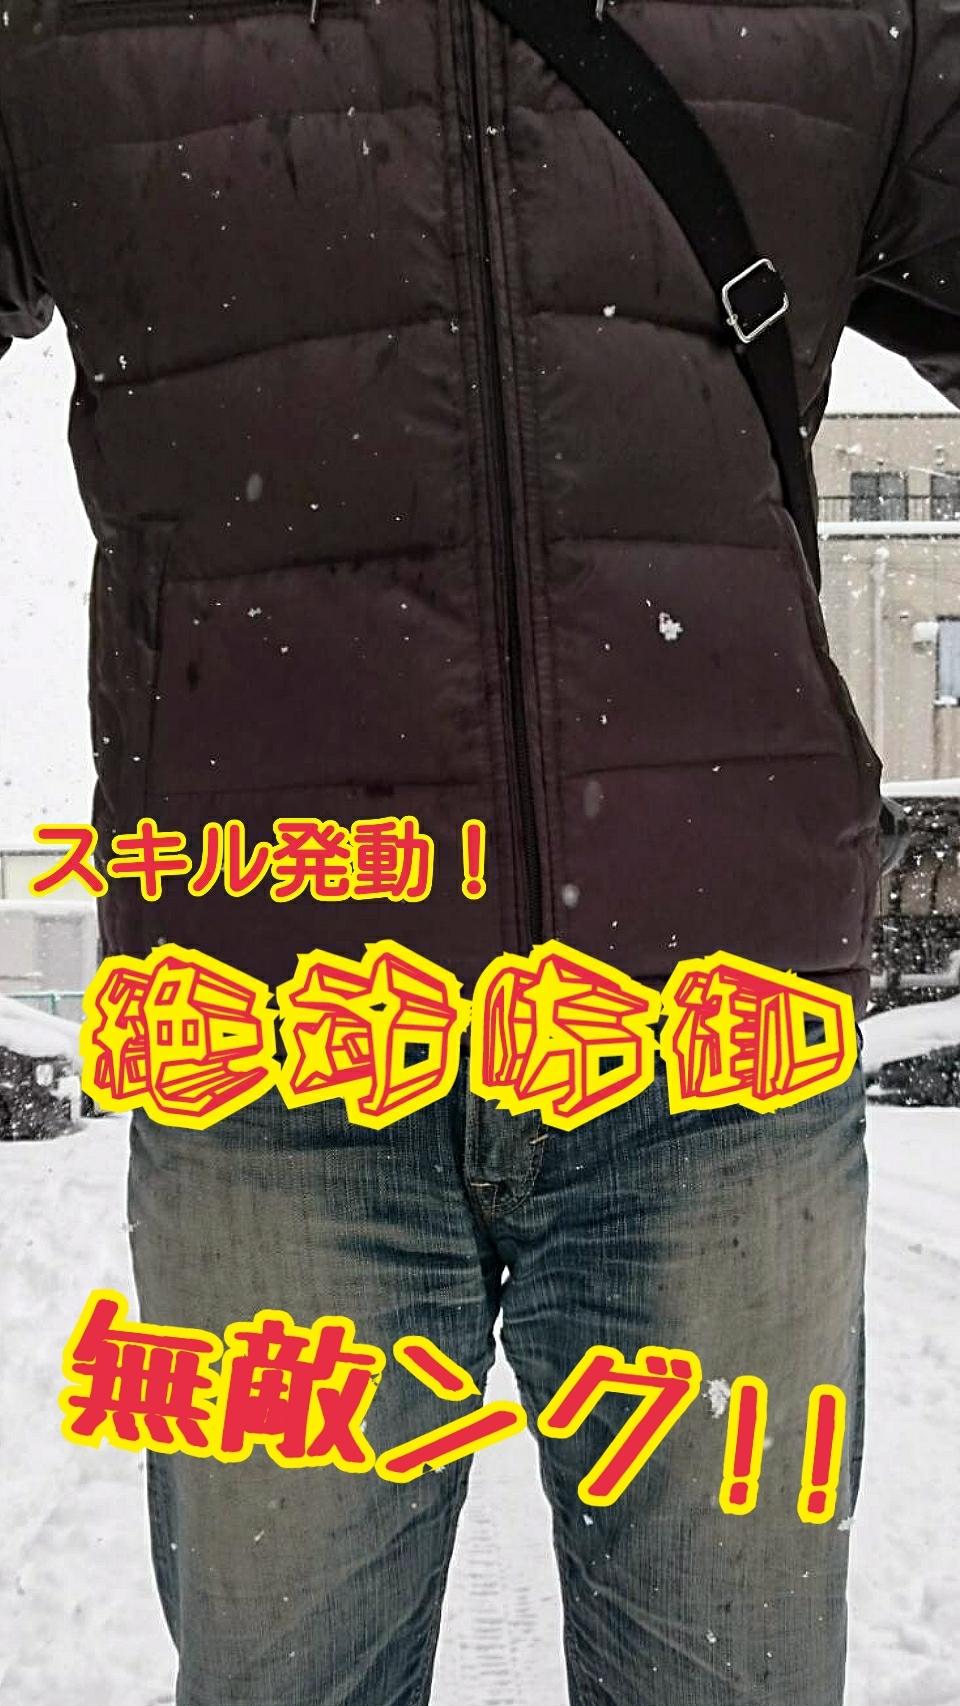 17-01-18-00-26-03-953_deco.jpg